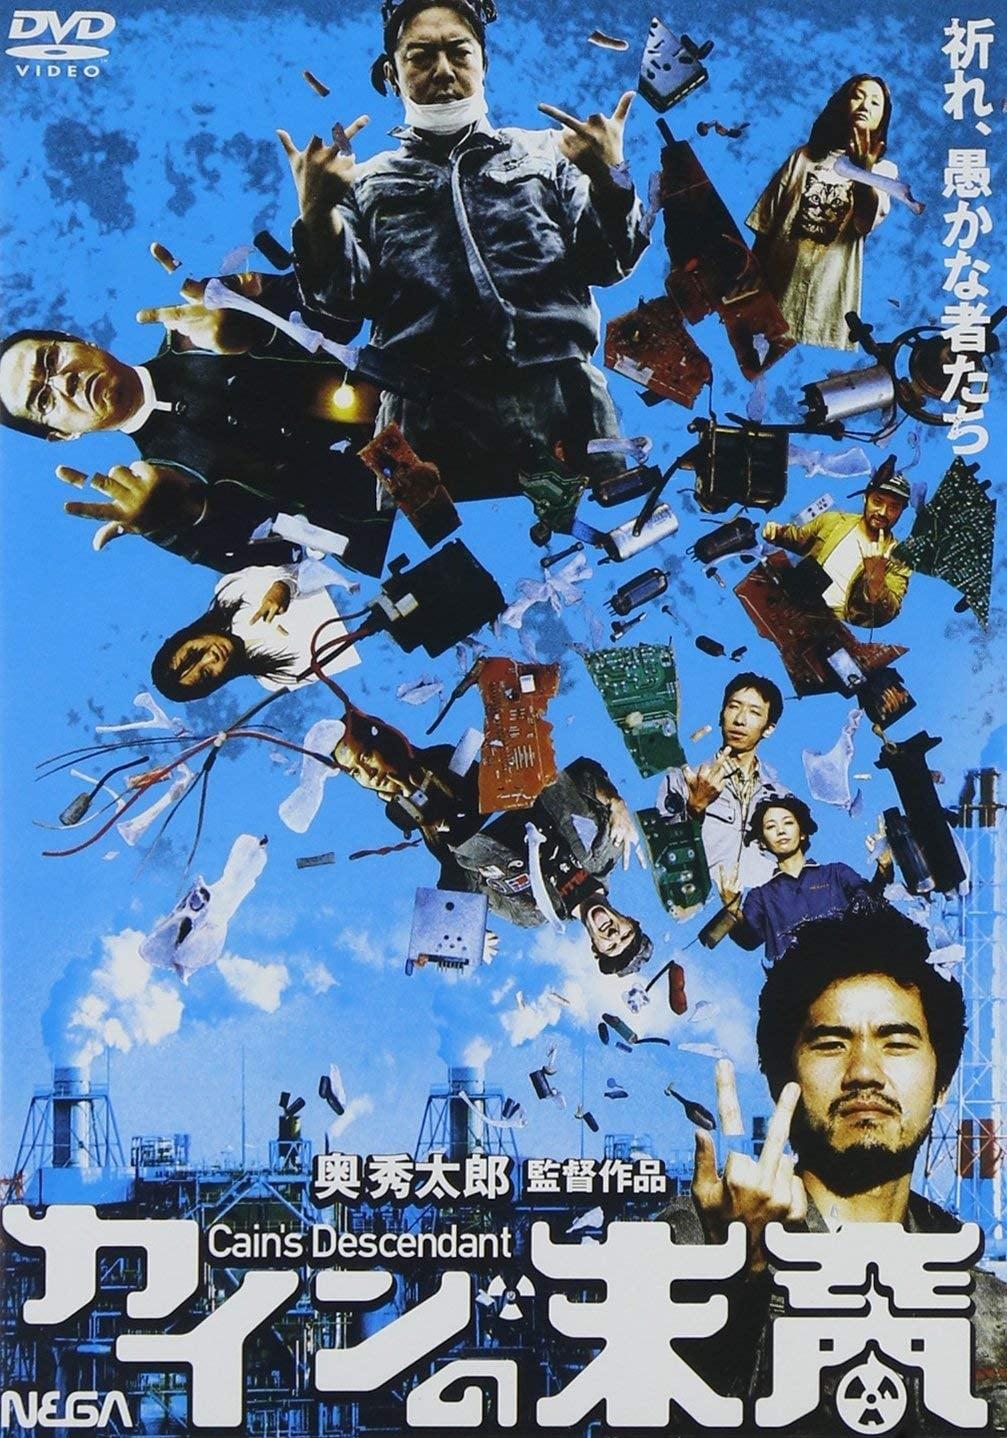 Cain's Descendant (2007)